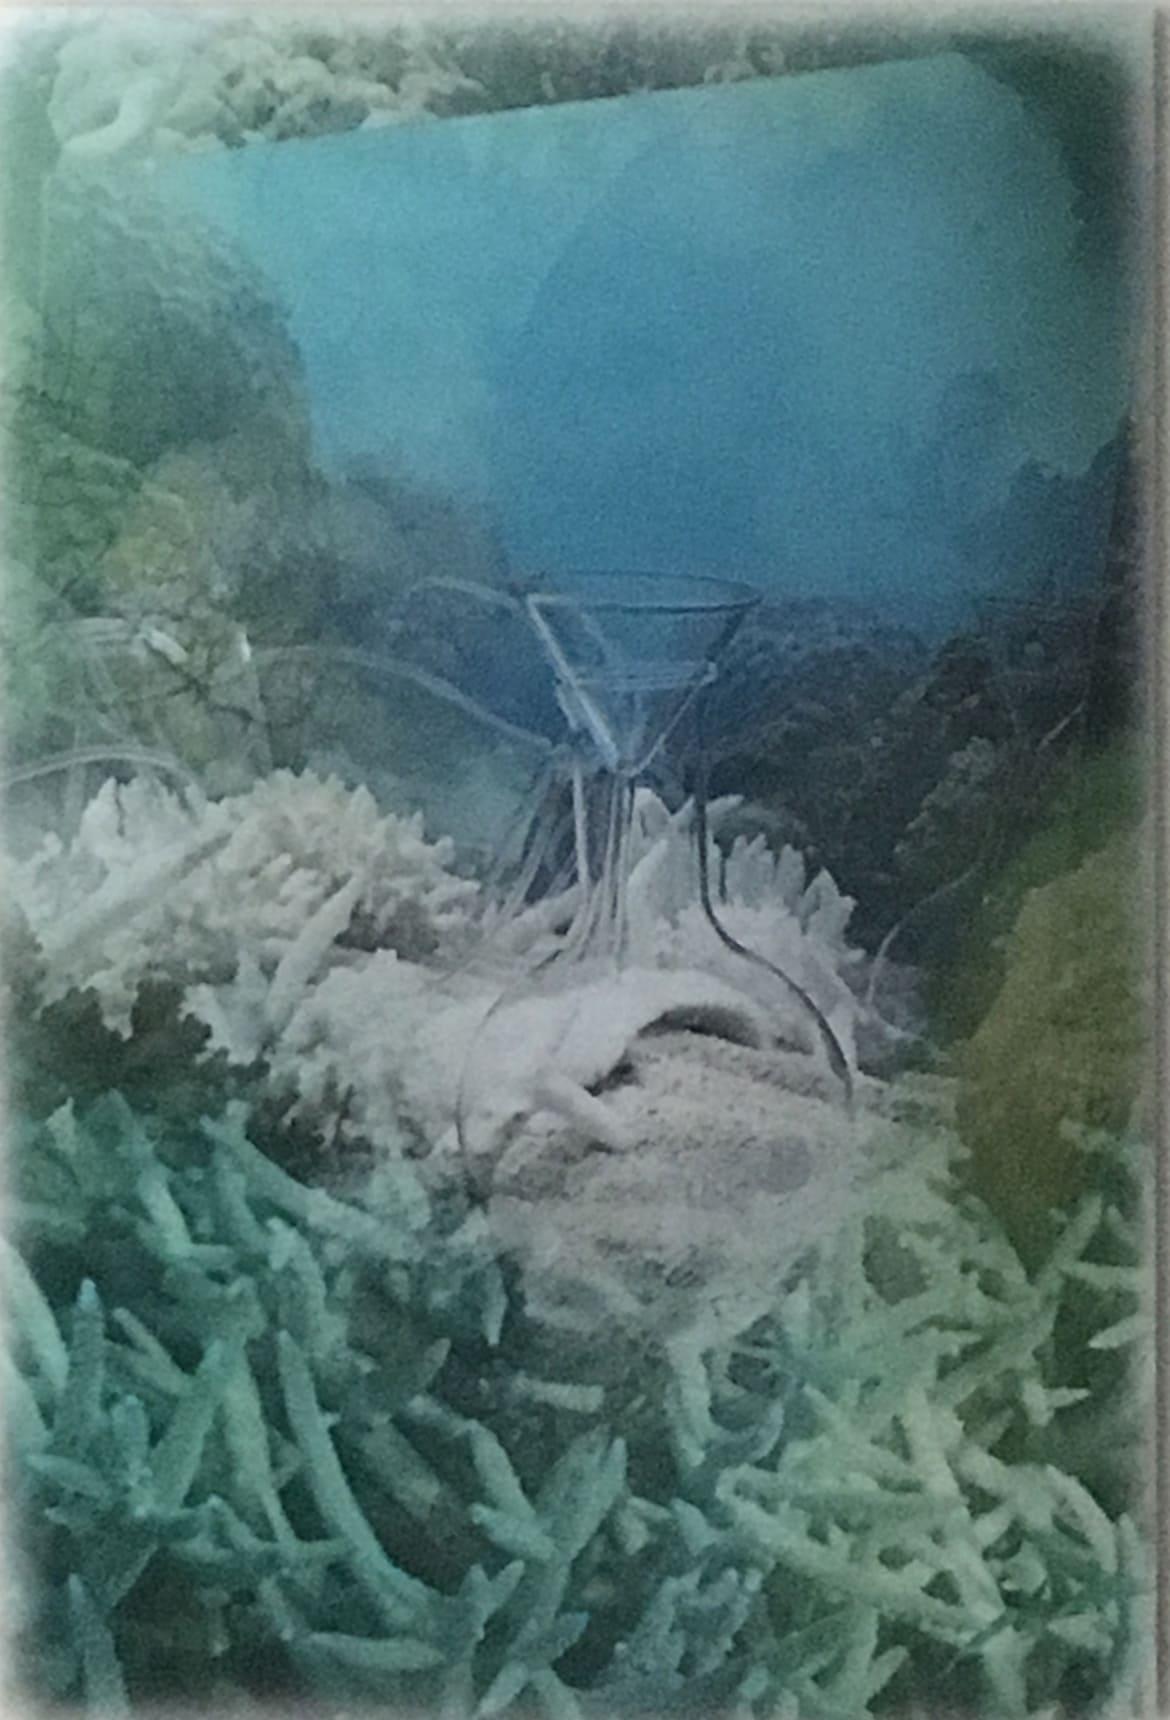 Janet Laurence in Ocean Imaginaries at RMIT Gallery